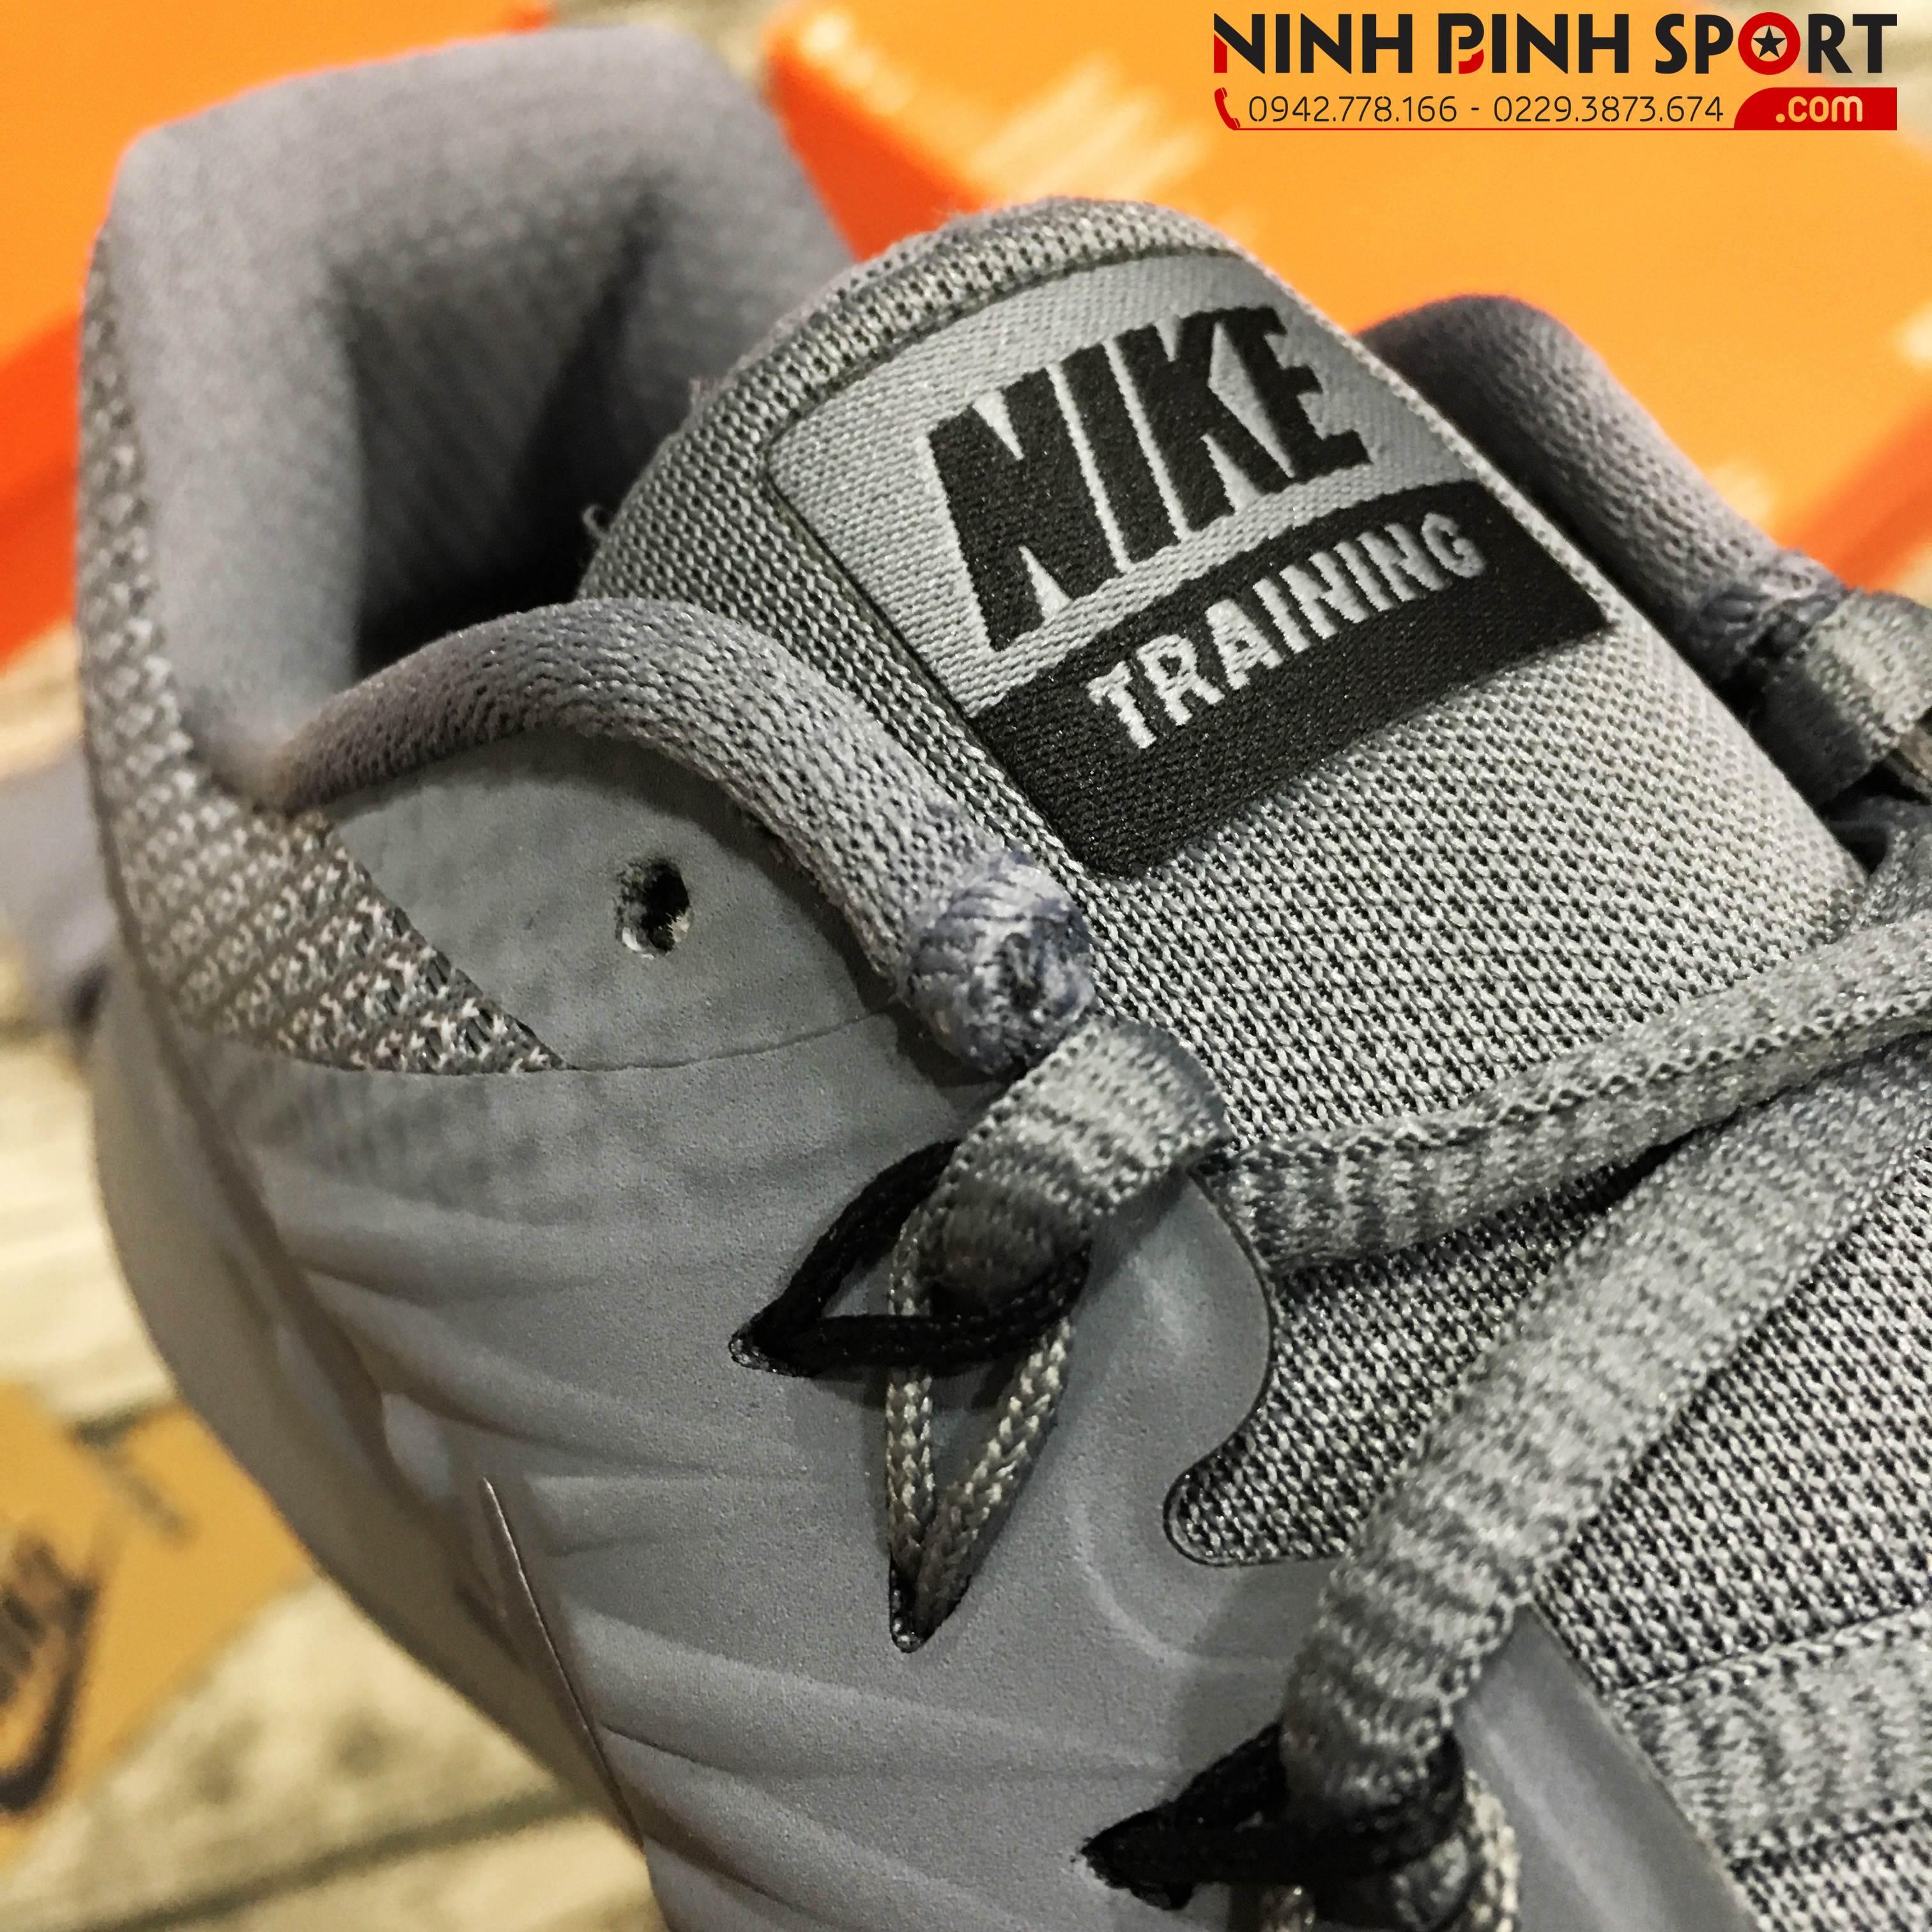 Giầy thể thao nam Nike LUNAR PRIME IRON 908969-016